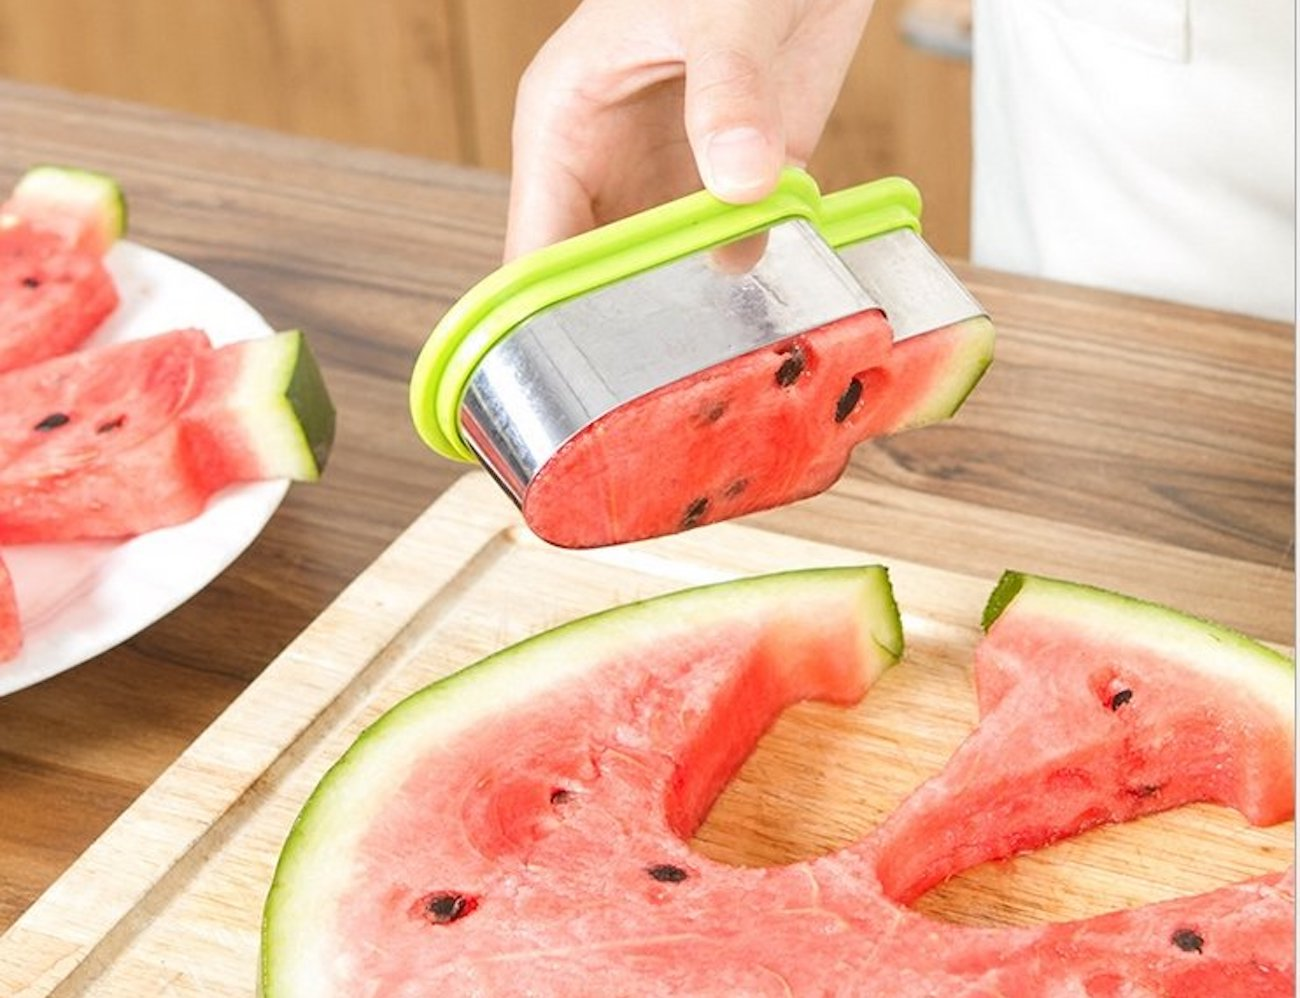 Muangan Popsicle Shape Watermelon Cutter